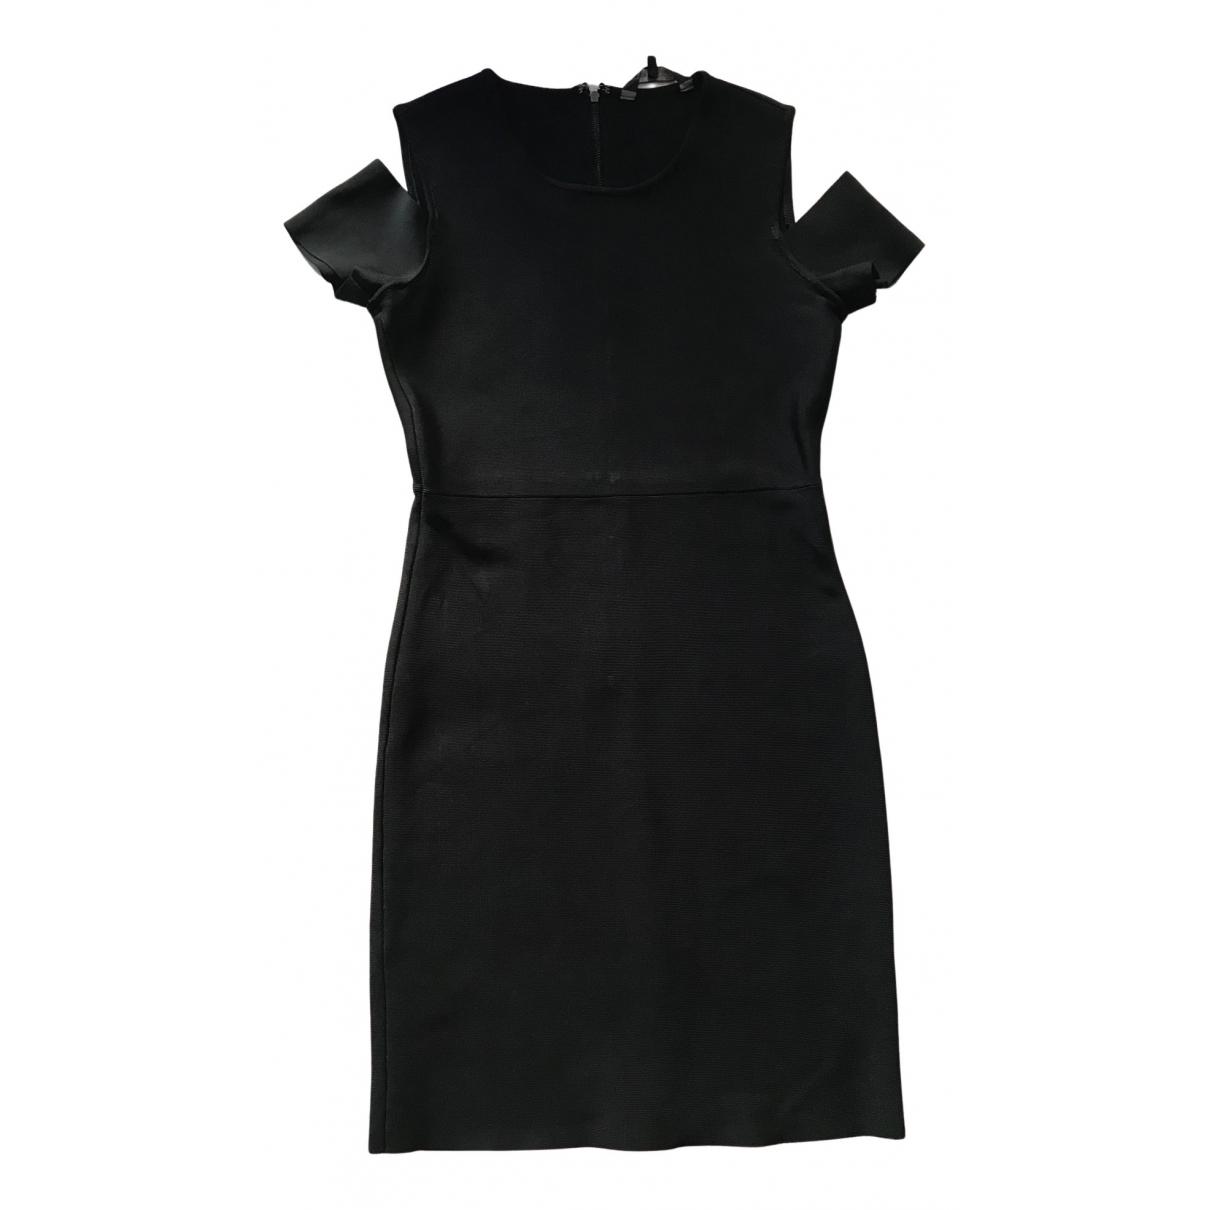 Bcbg Max Azria N Black dress for Women 36 FR